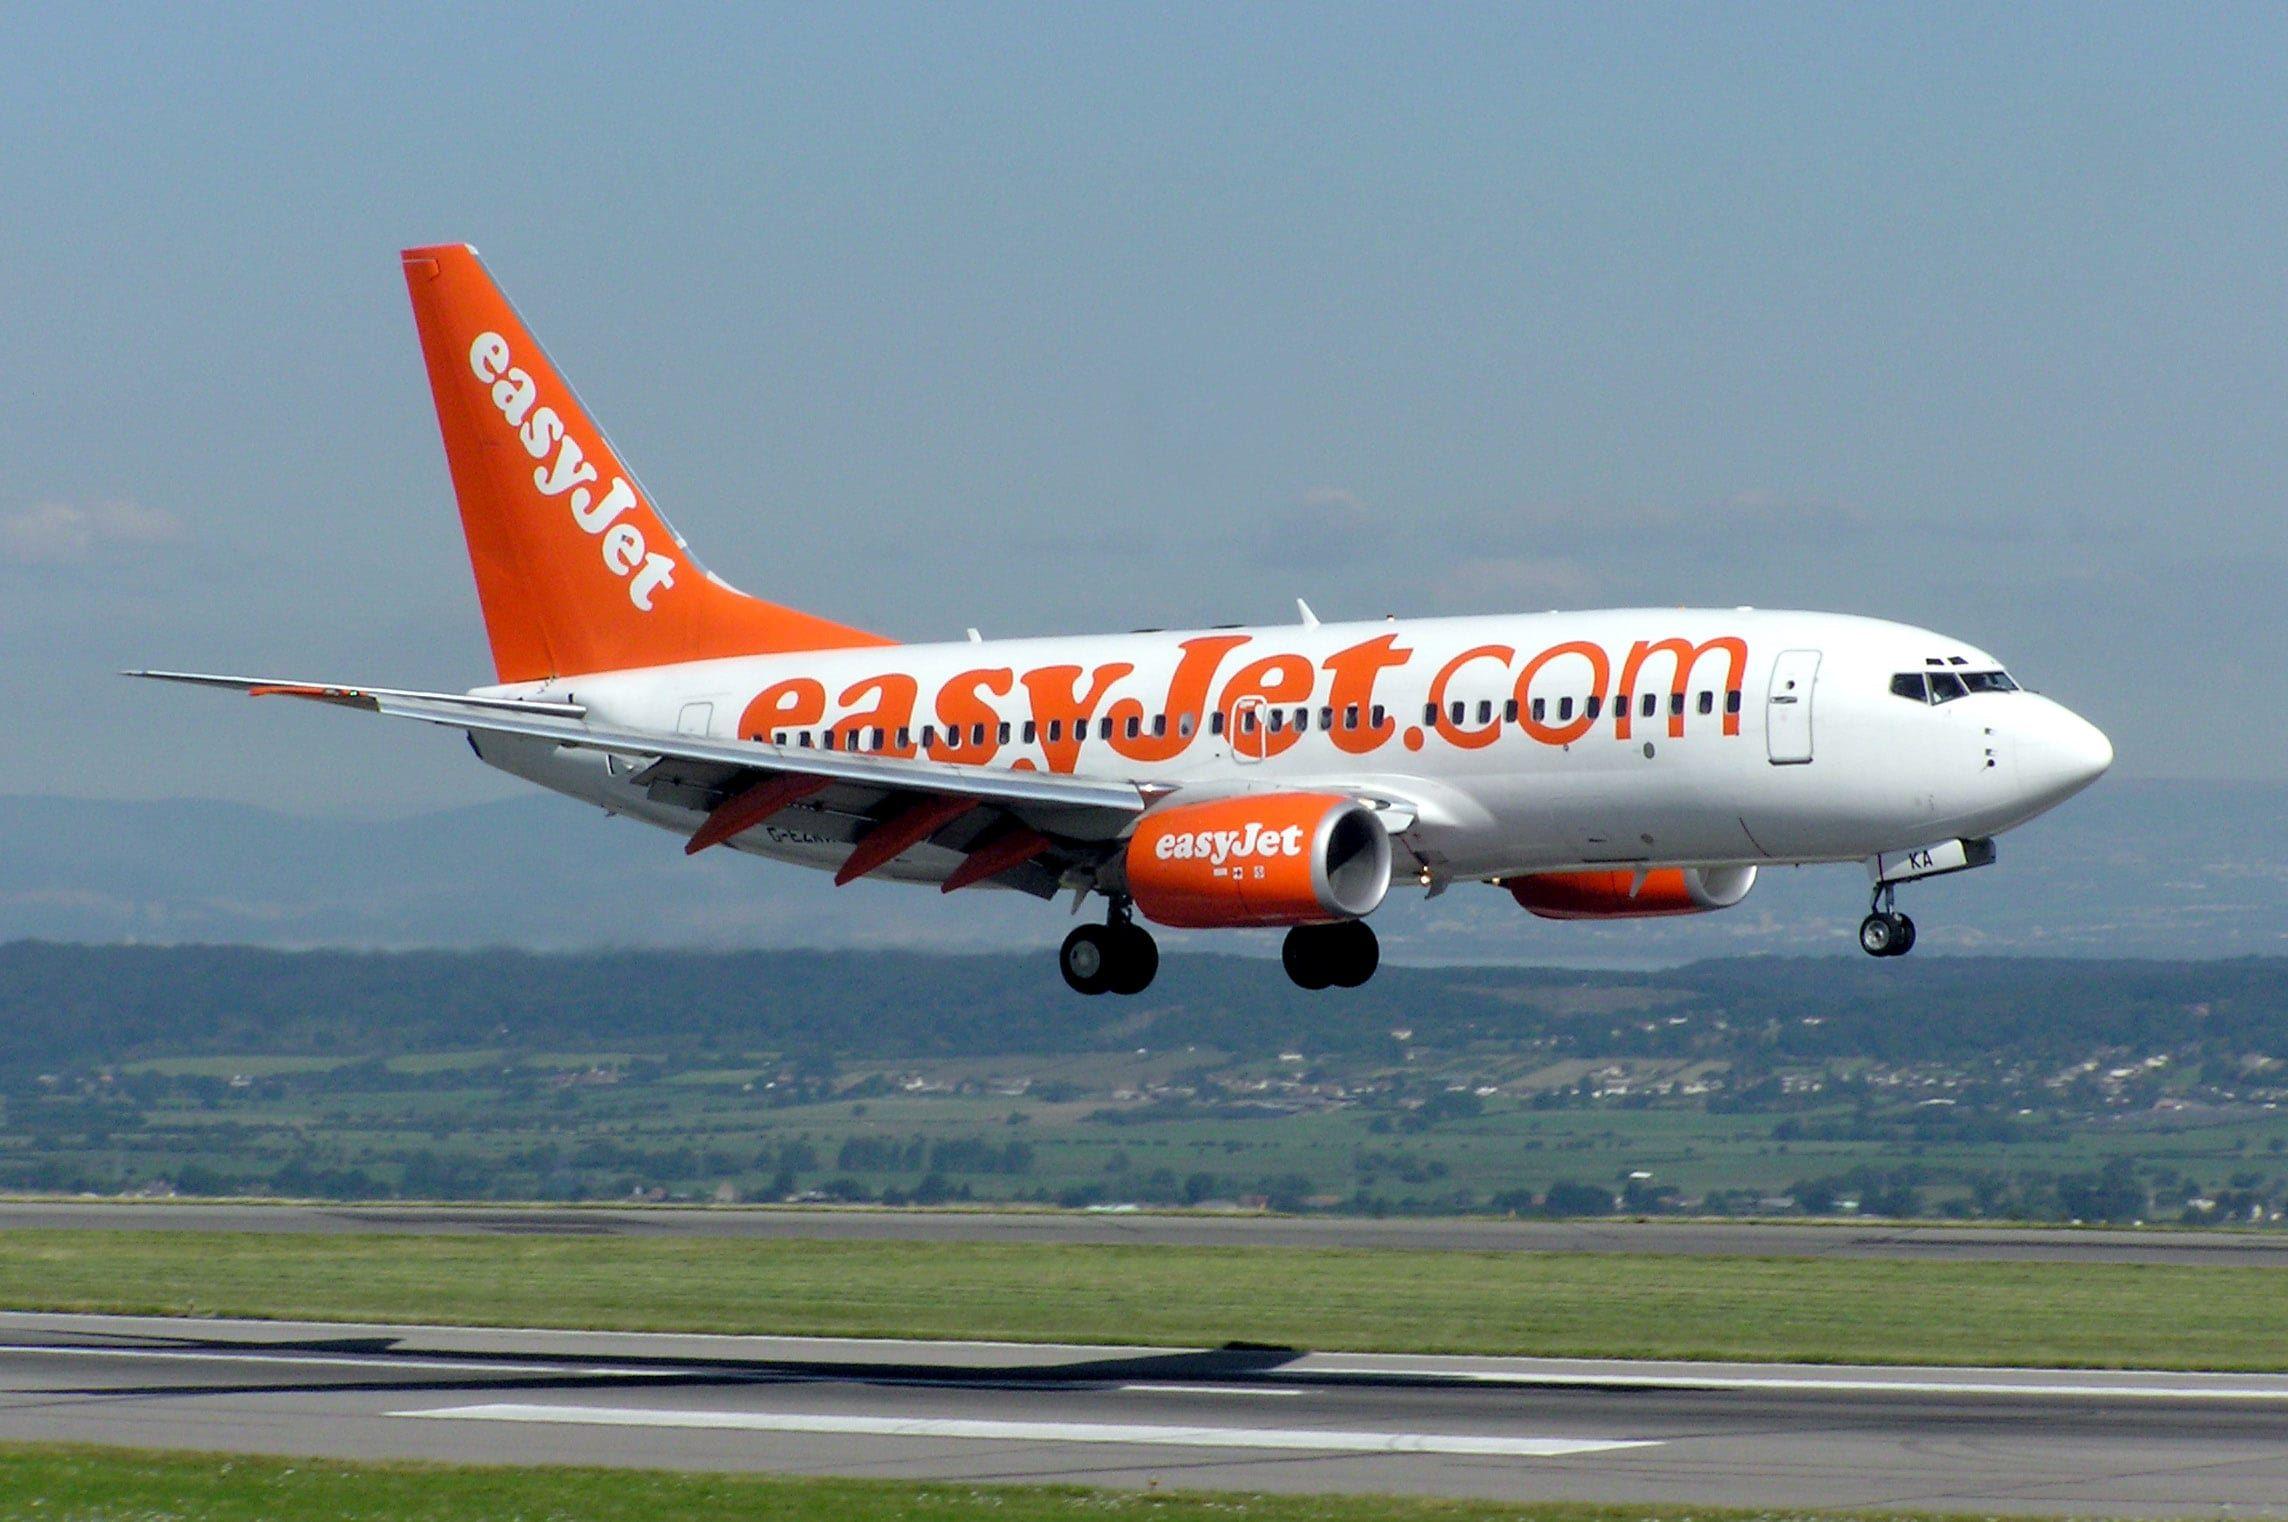 EasyJet passenger dies on board flight from Spain's Costa